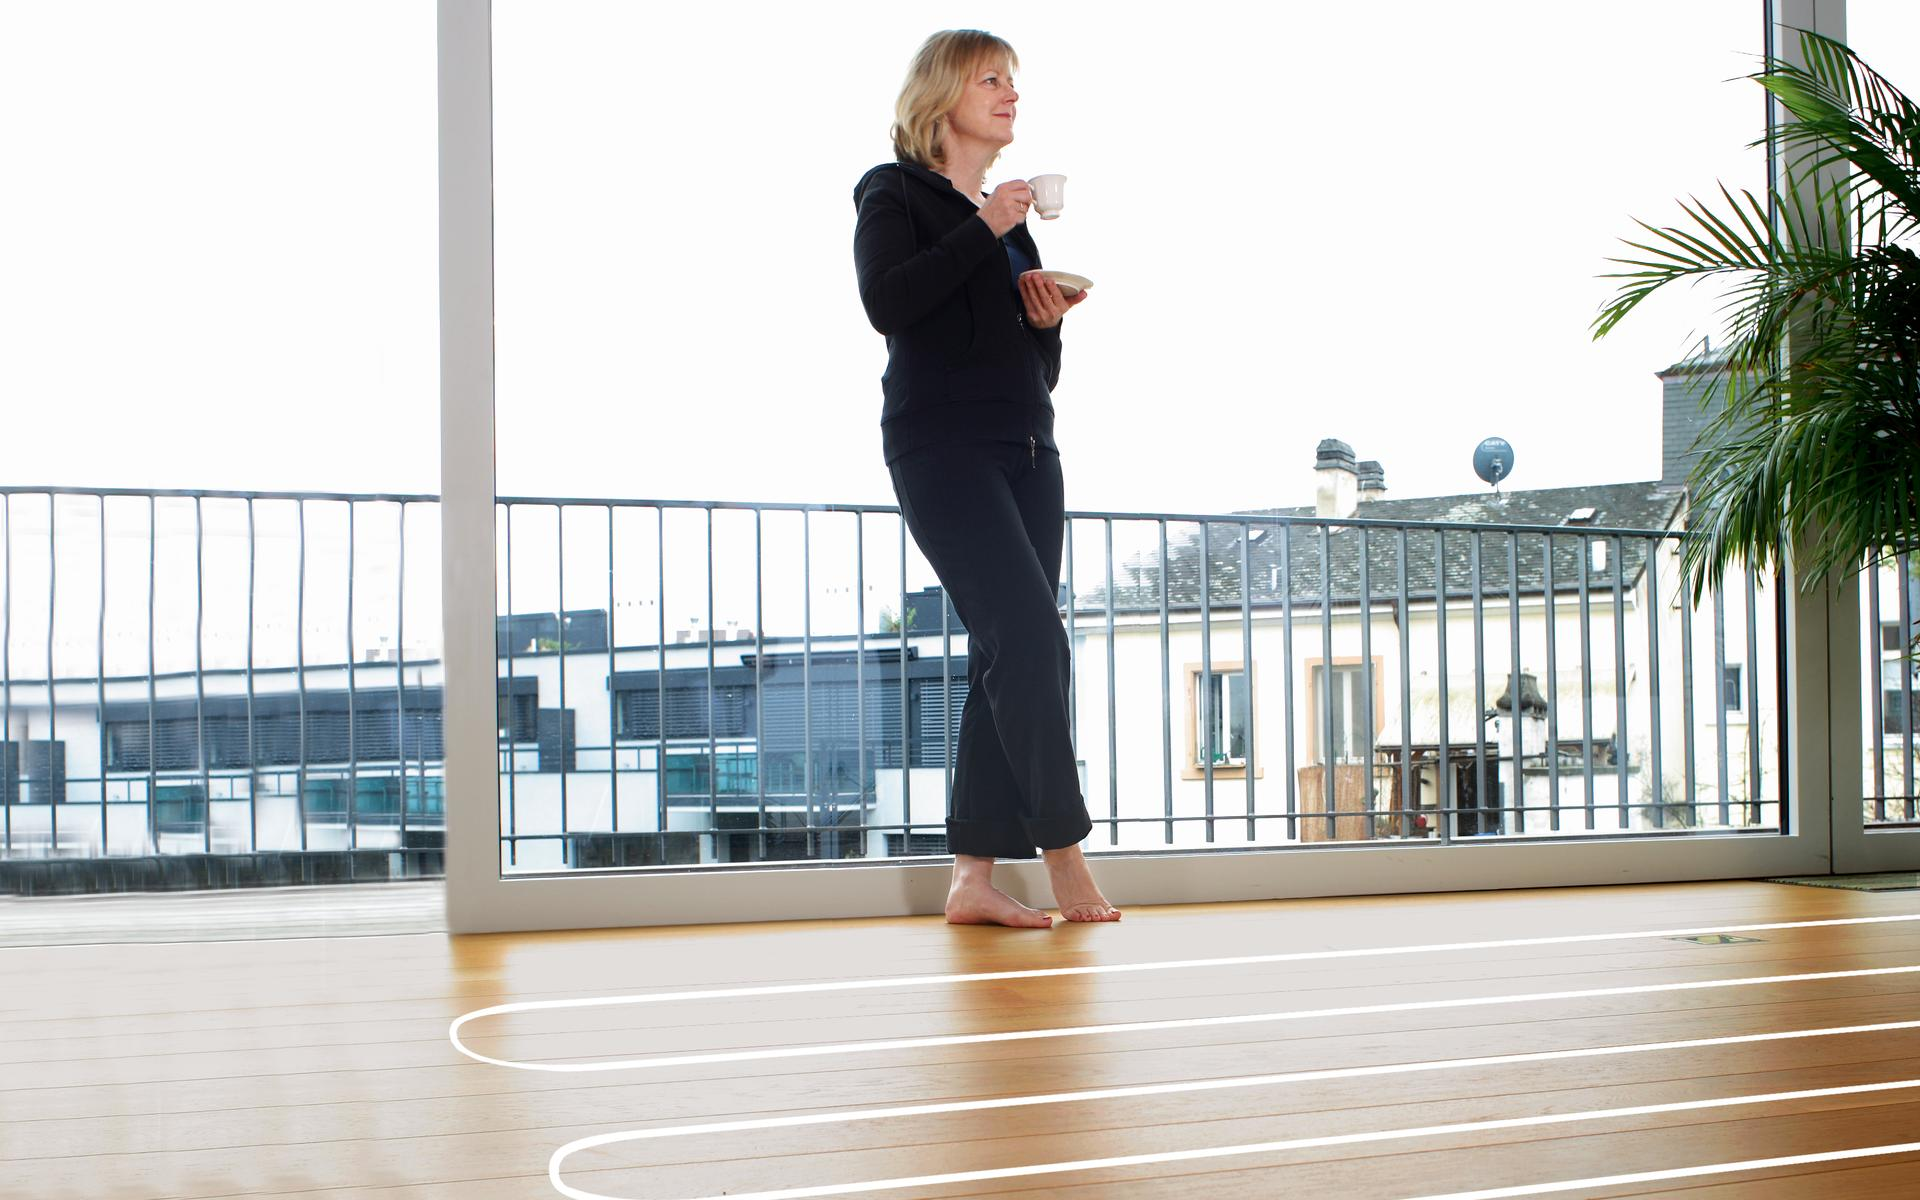 Fußboden Ohne Estrich ~ Fußbodenheizung mundle sindelfingen böblingen bei stuttgart